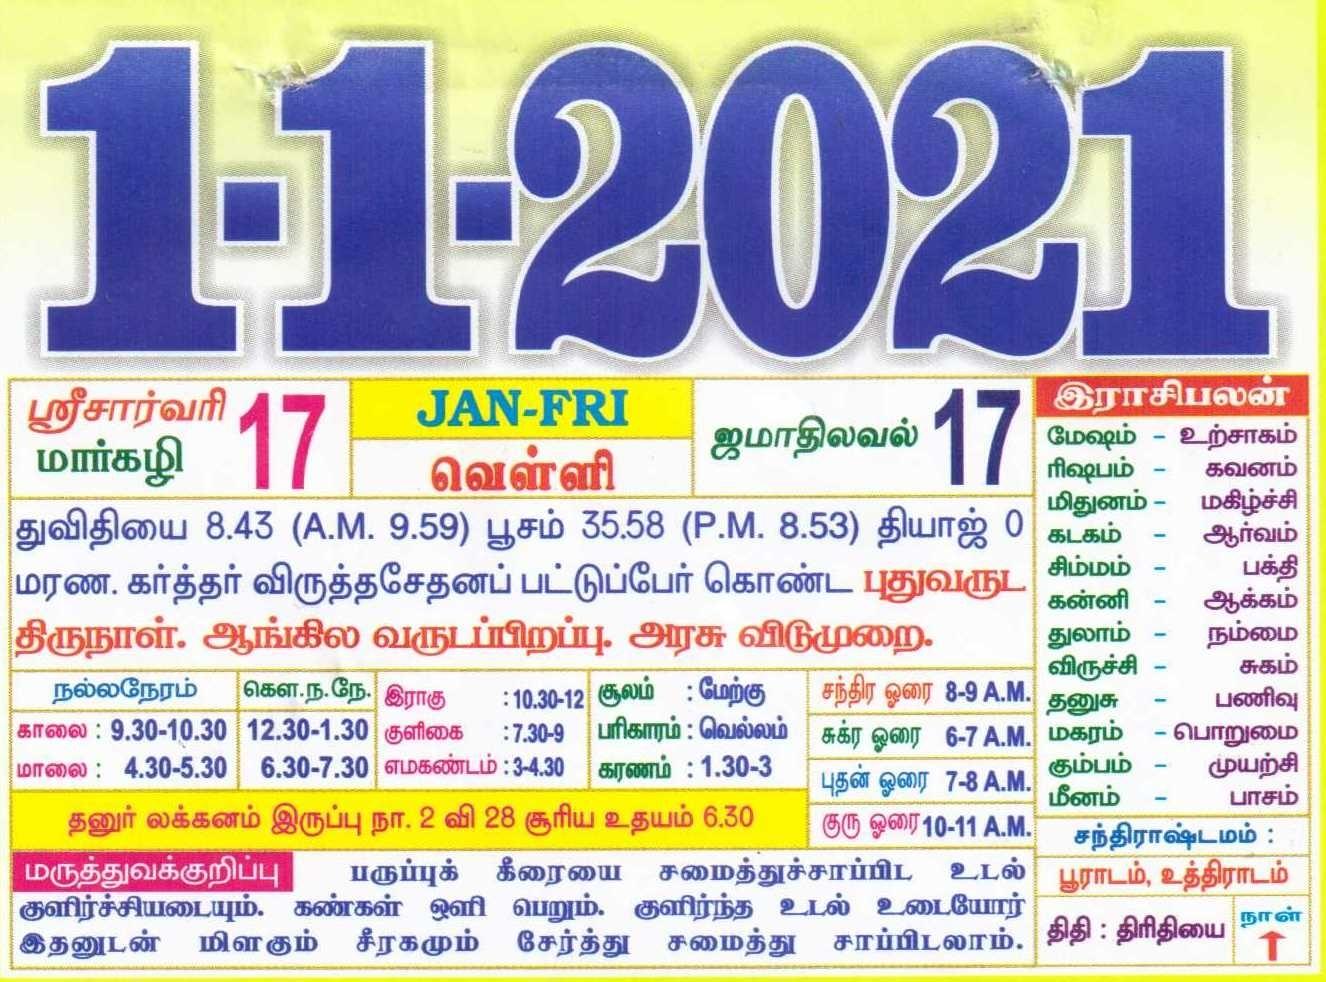 01-01-2021 Daily Calendar | Date 01 , January Daily Tear Off Calendar | Daily Panchangam Rasi Palan Marriage Dates In November 2021 Hindu Calendar